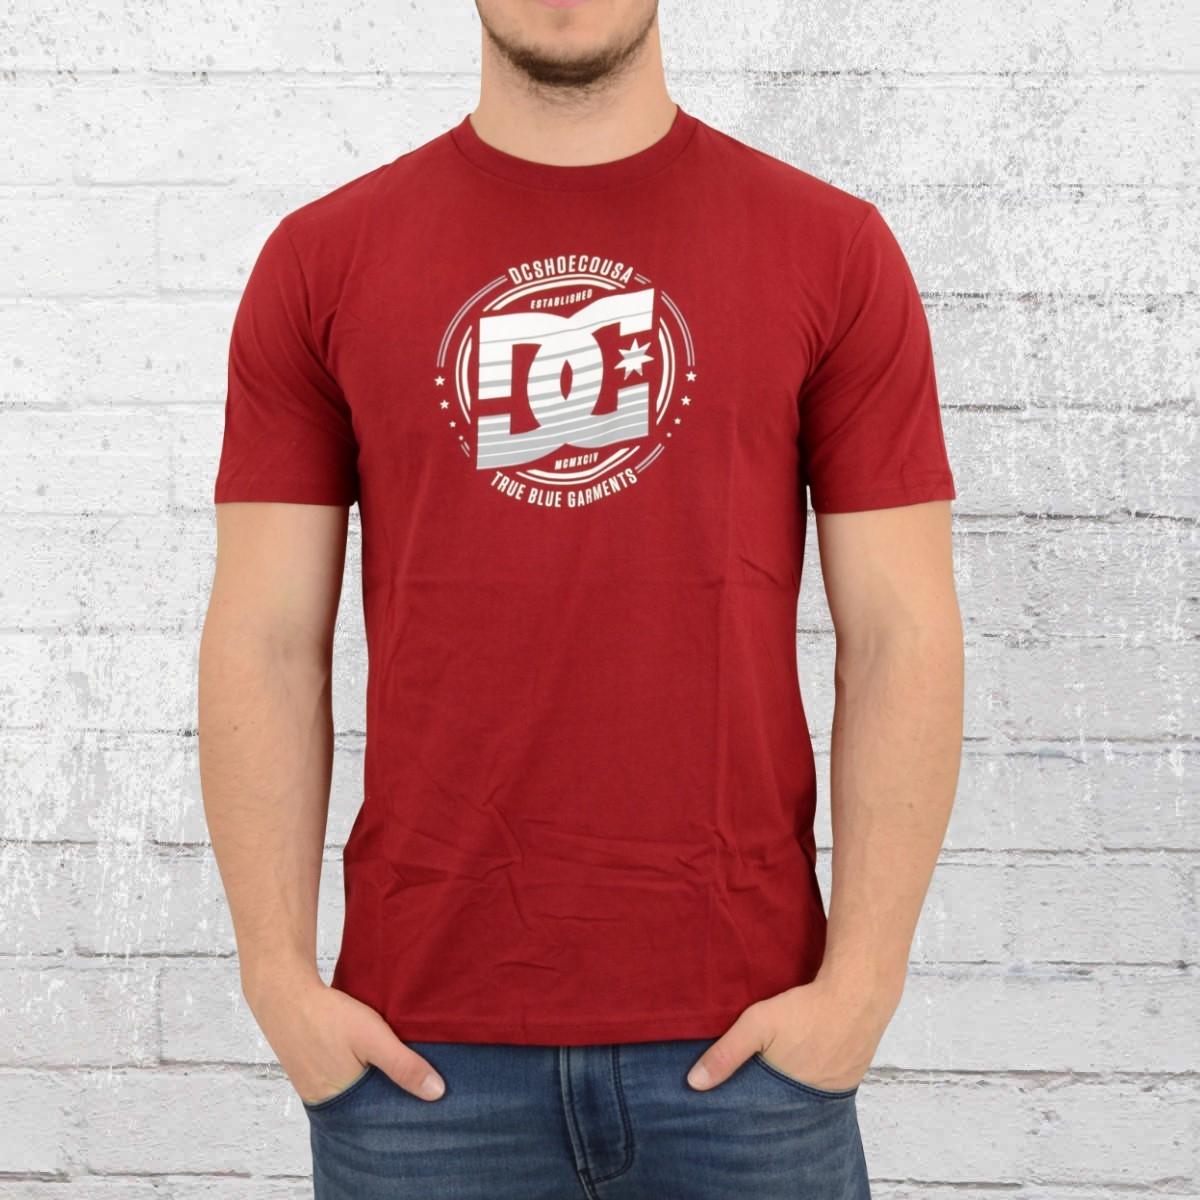 DC Shoes Herren T-Shirt Heraldry rot